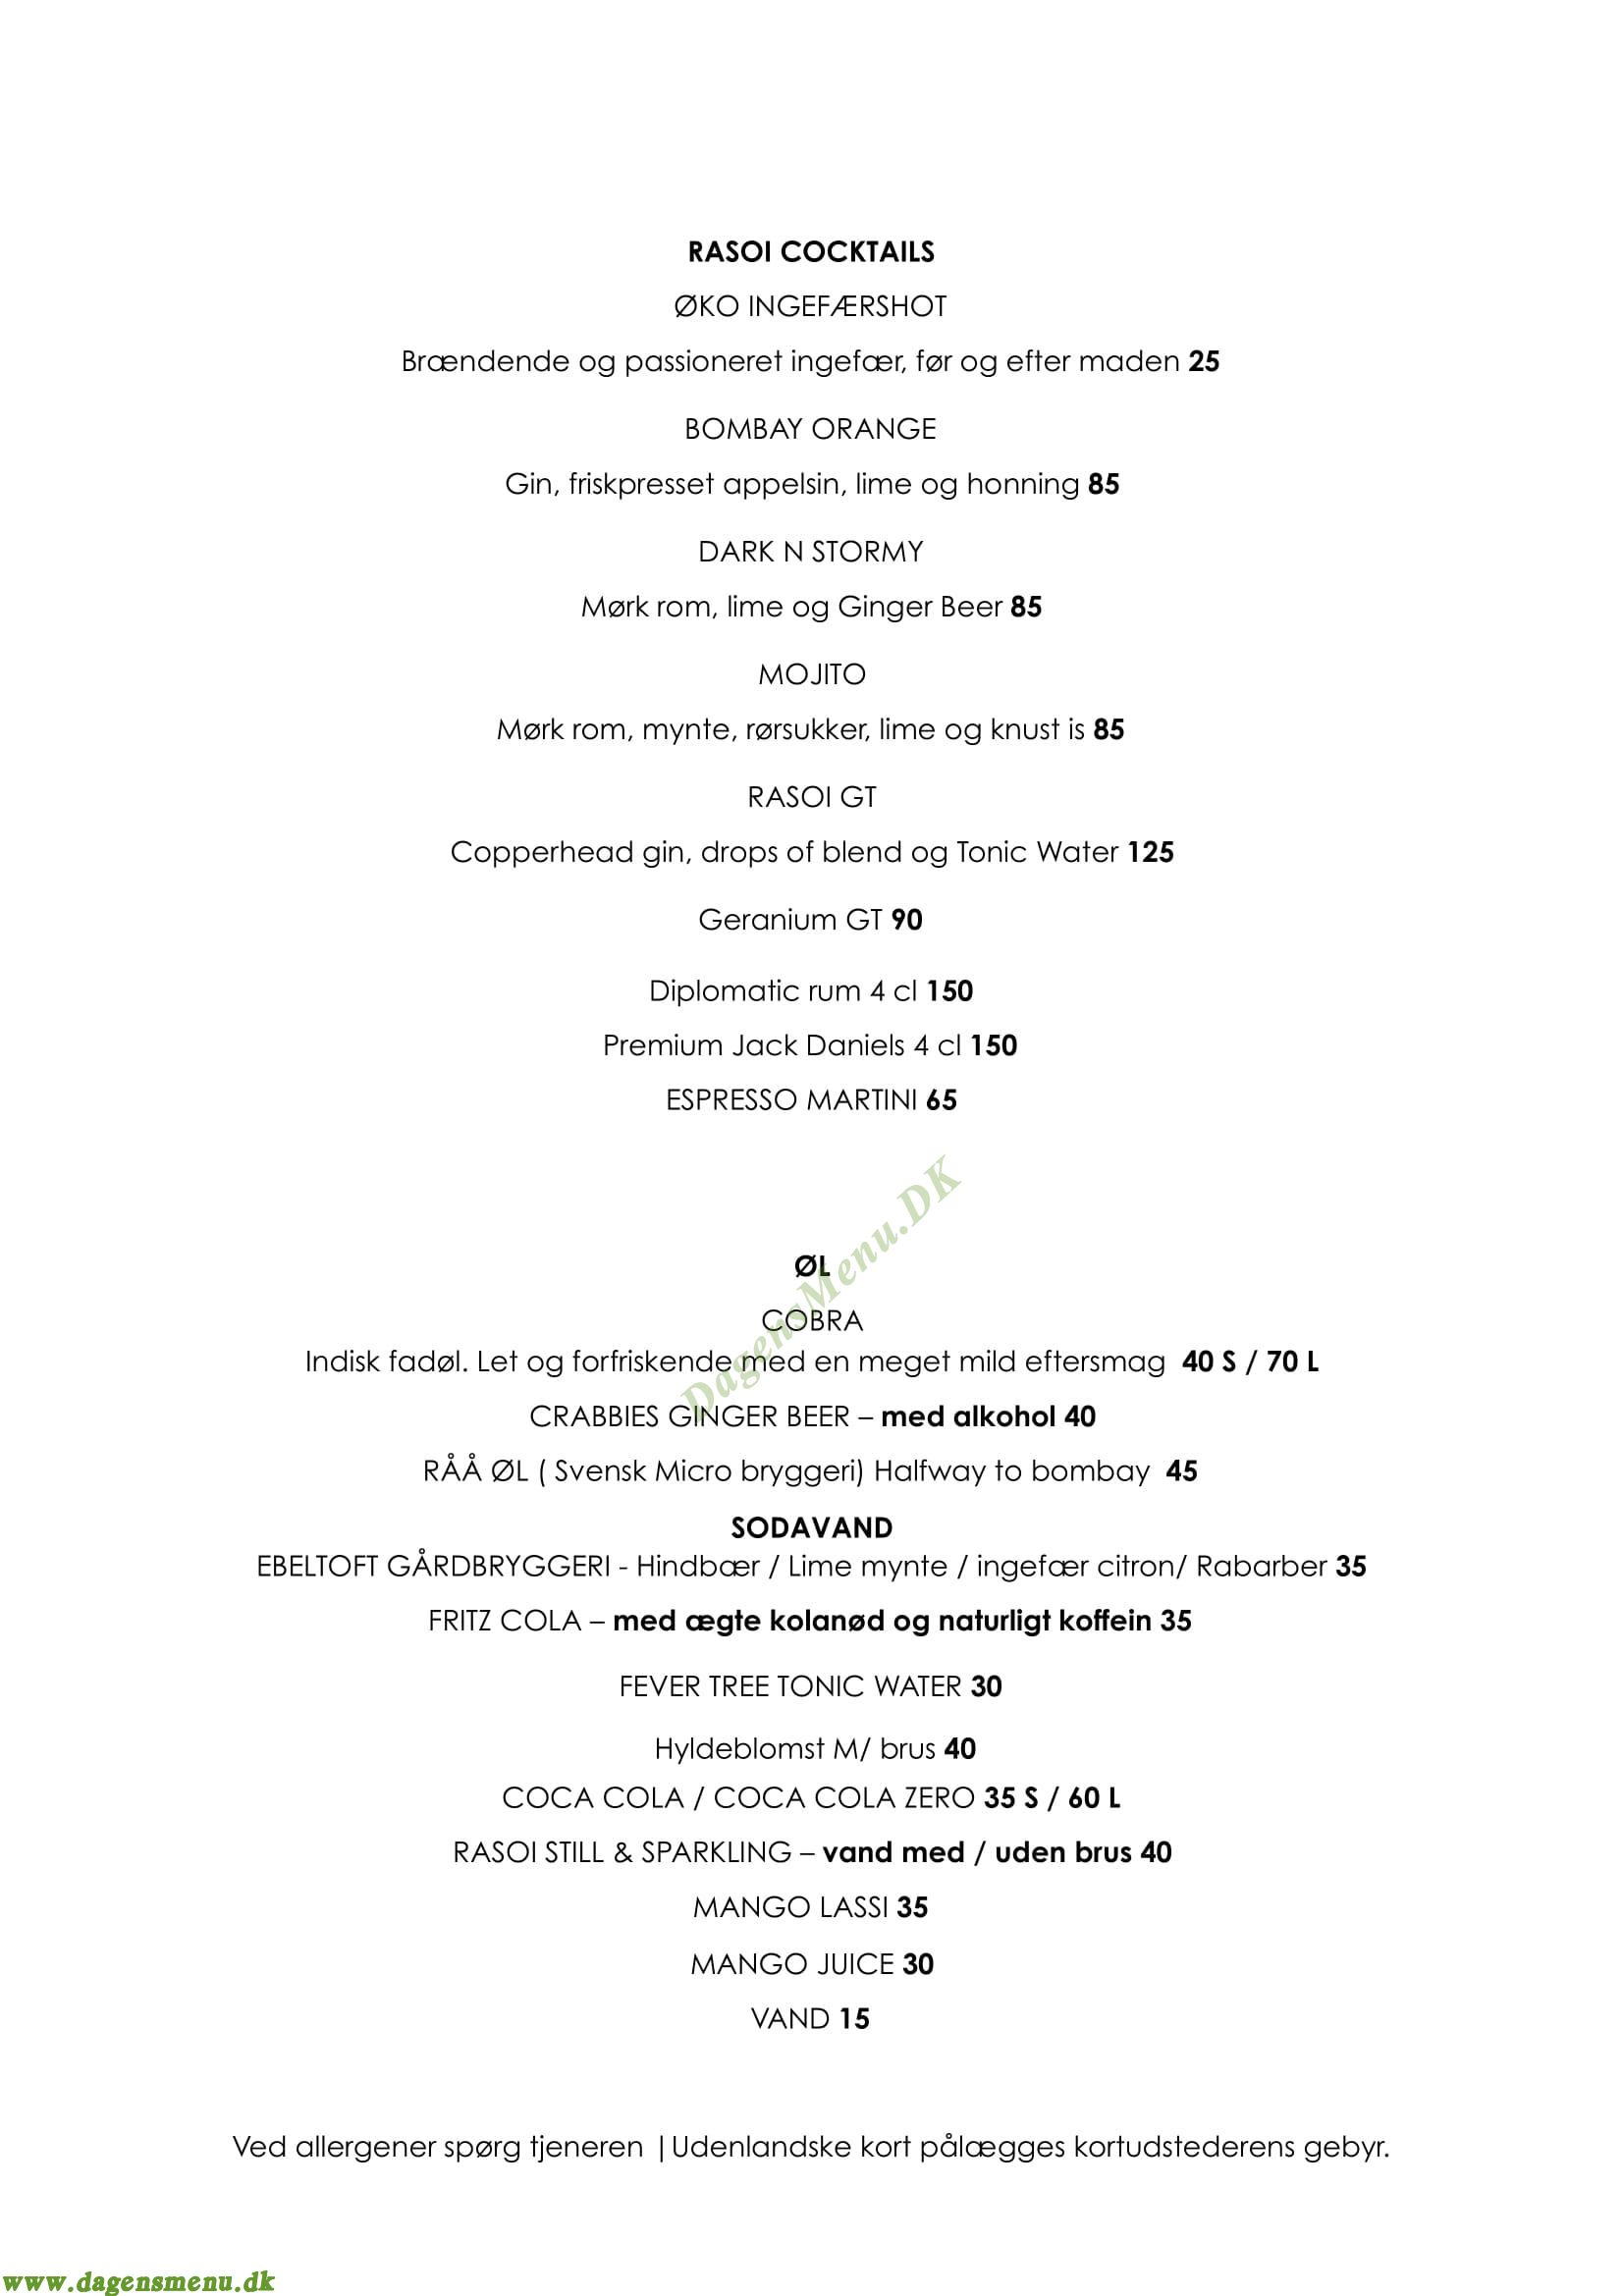 Restaurant Raso Royal Arena - Menukort